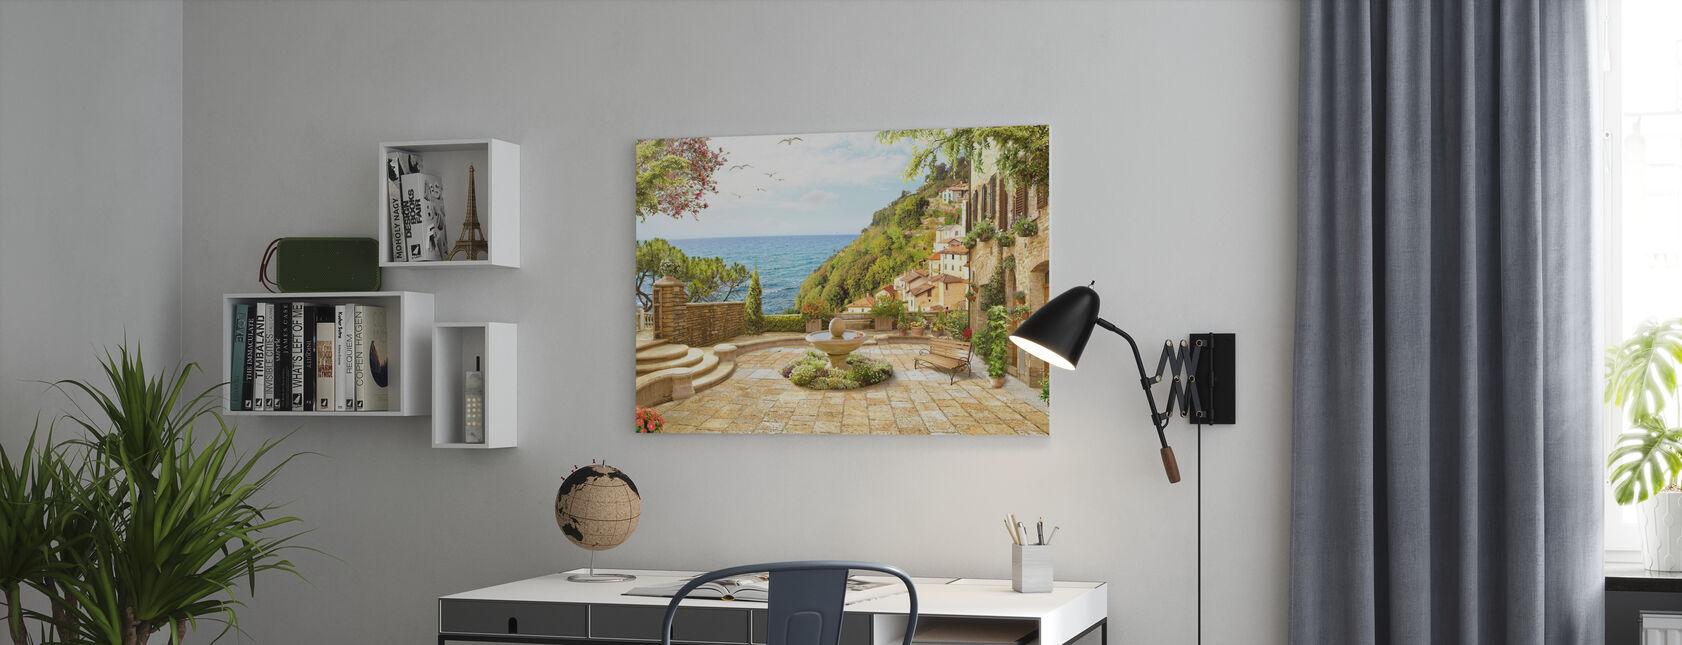 Vredig park aan zee - Canvas print - Kantoor